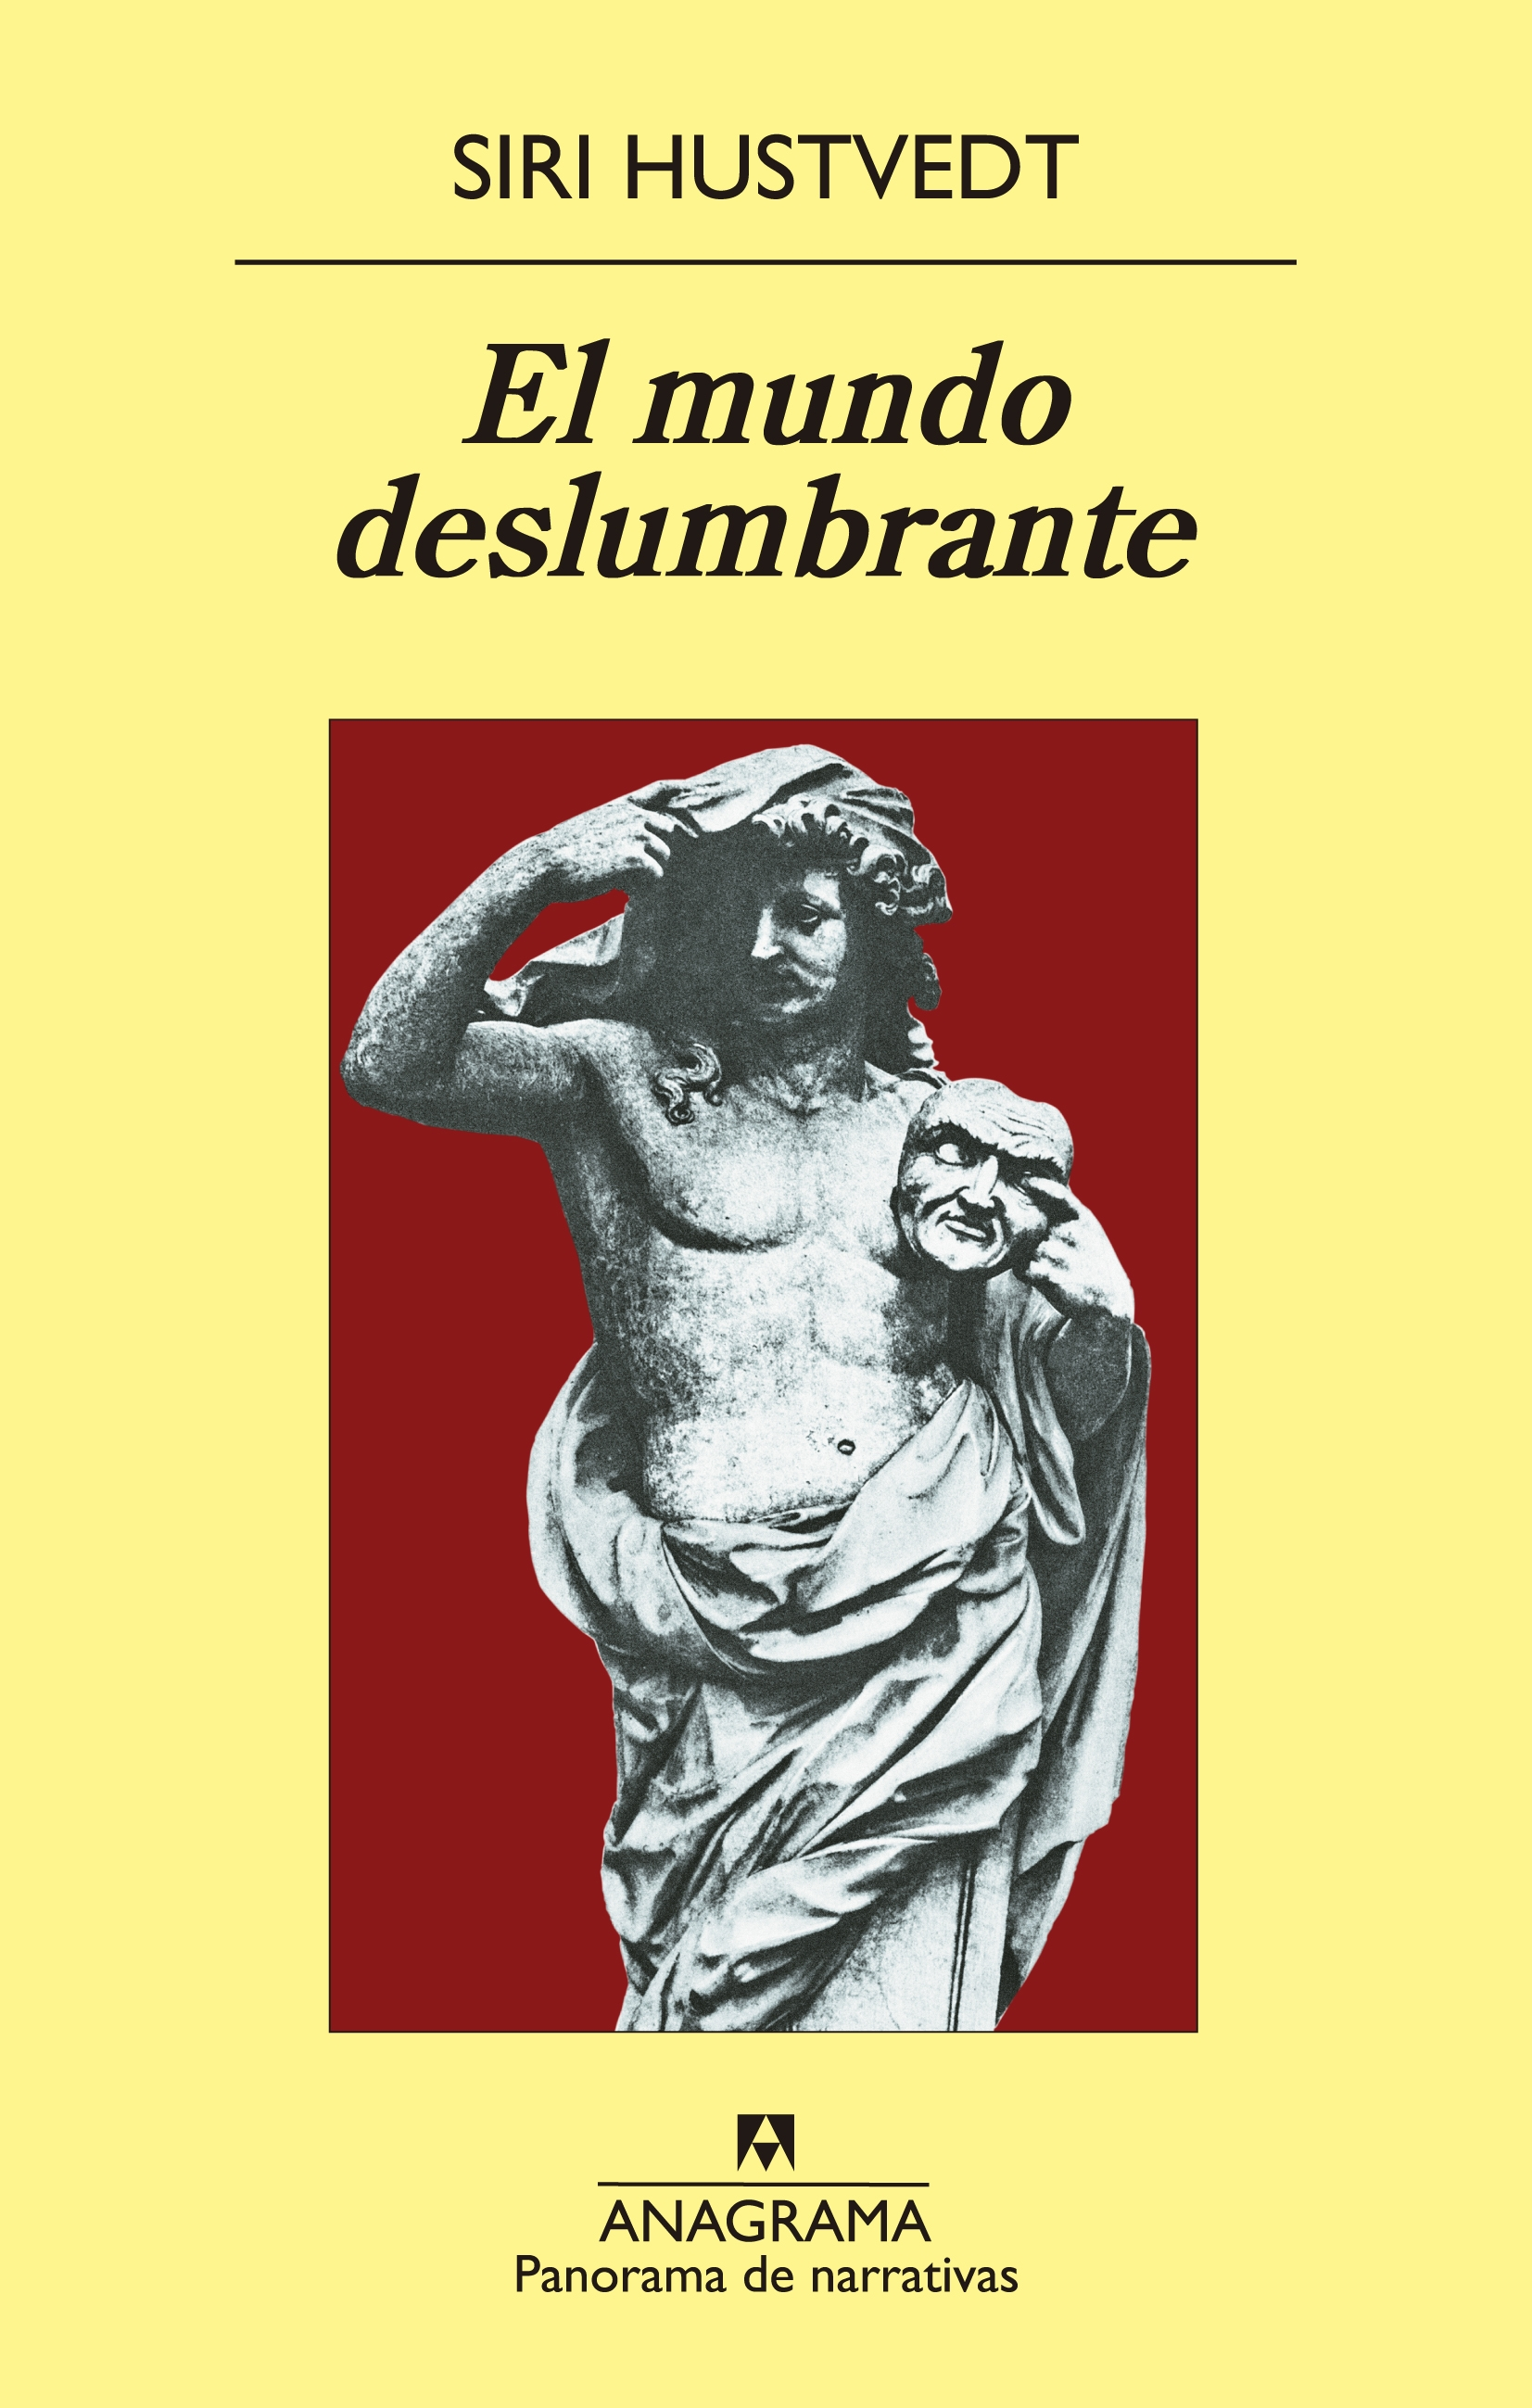 El mundo deslumbrante - Hustvedt, Siri - 978-84-339-7905-6 - Editorial  Anagrama